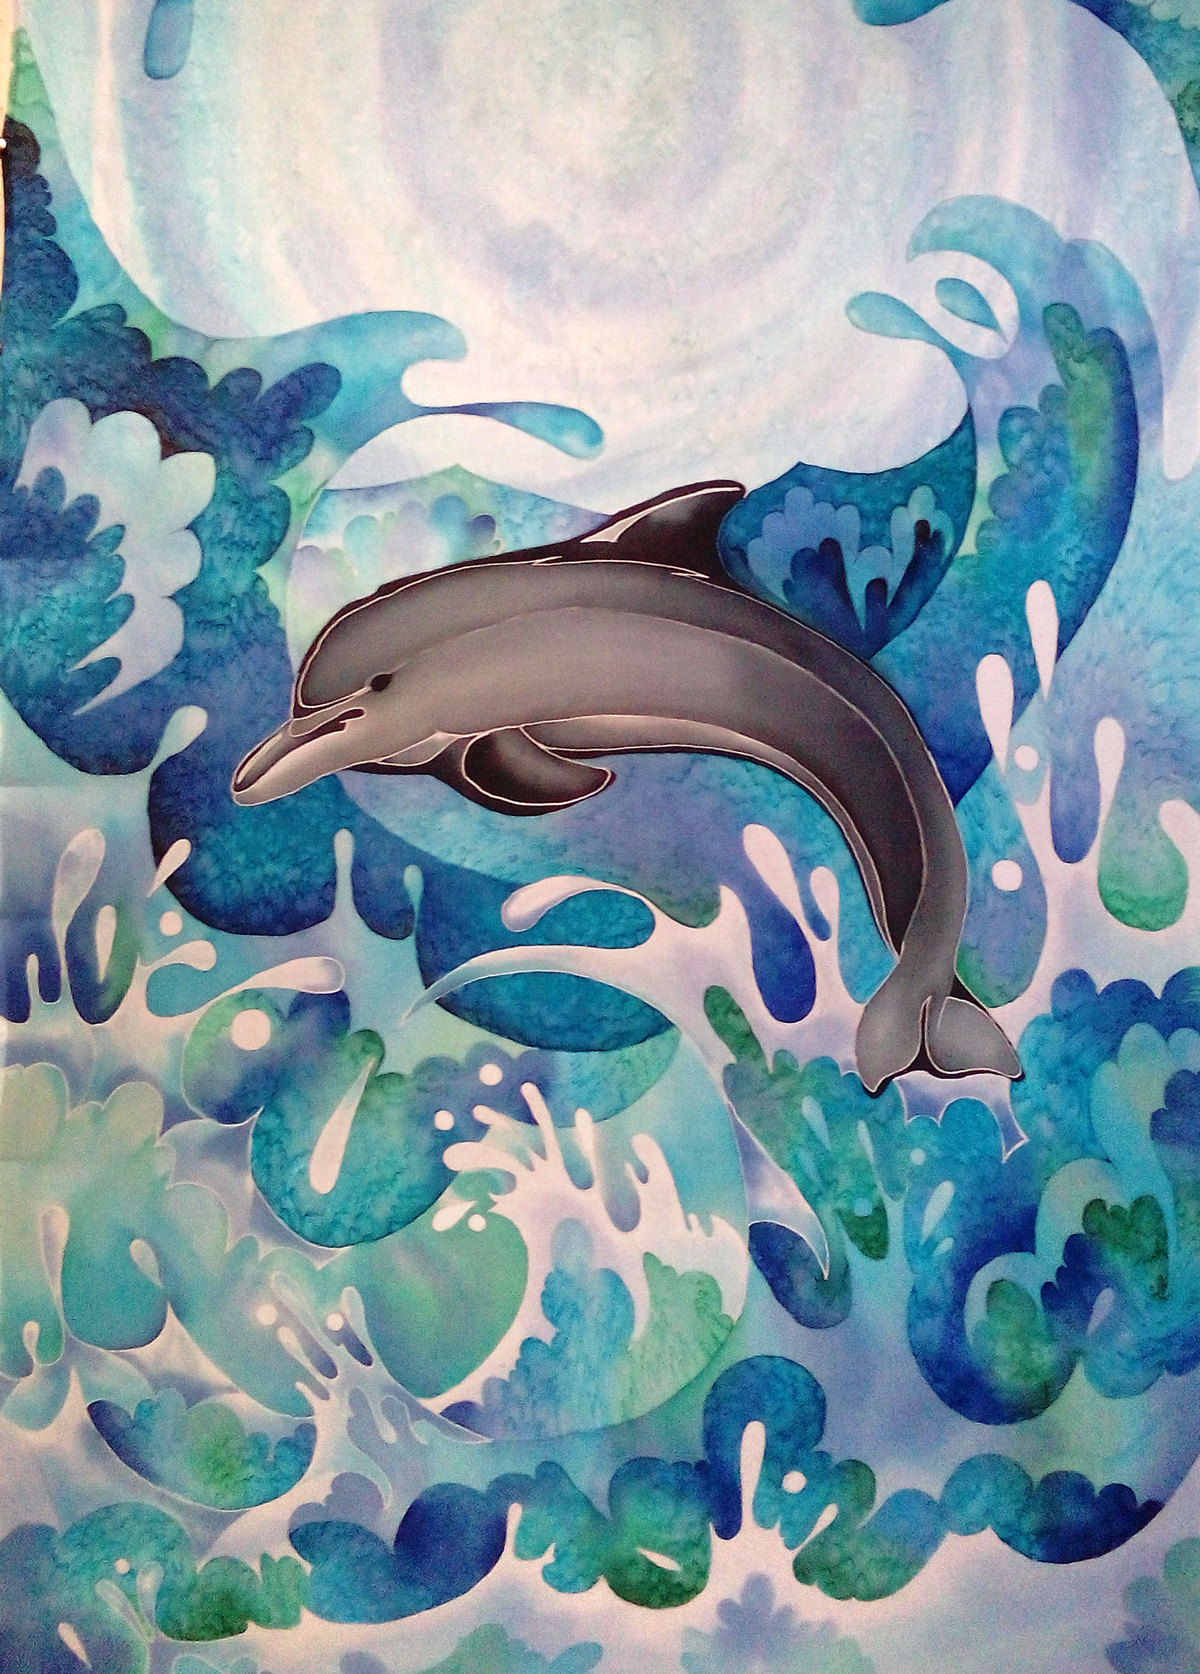 Дельфин холодный батик, шарф холодный батик, дельфин батик, море батик, волны батик,